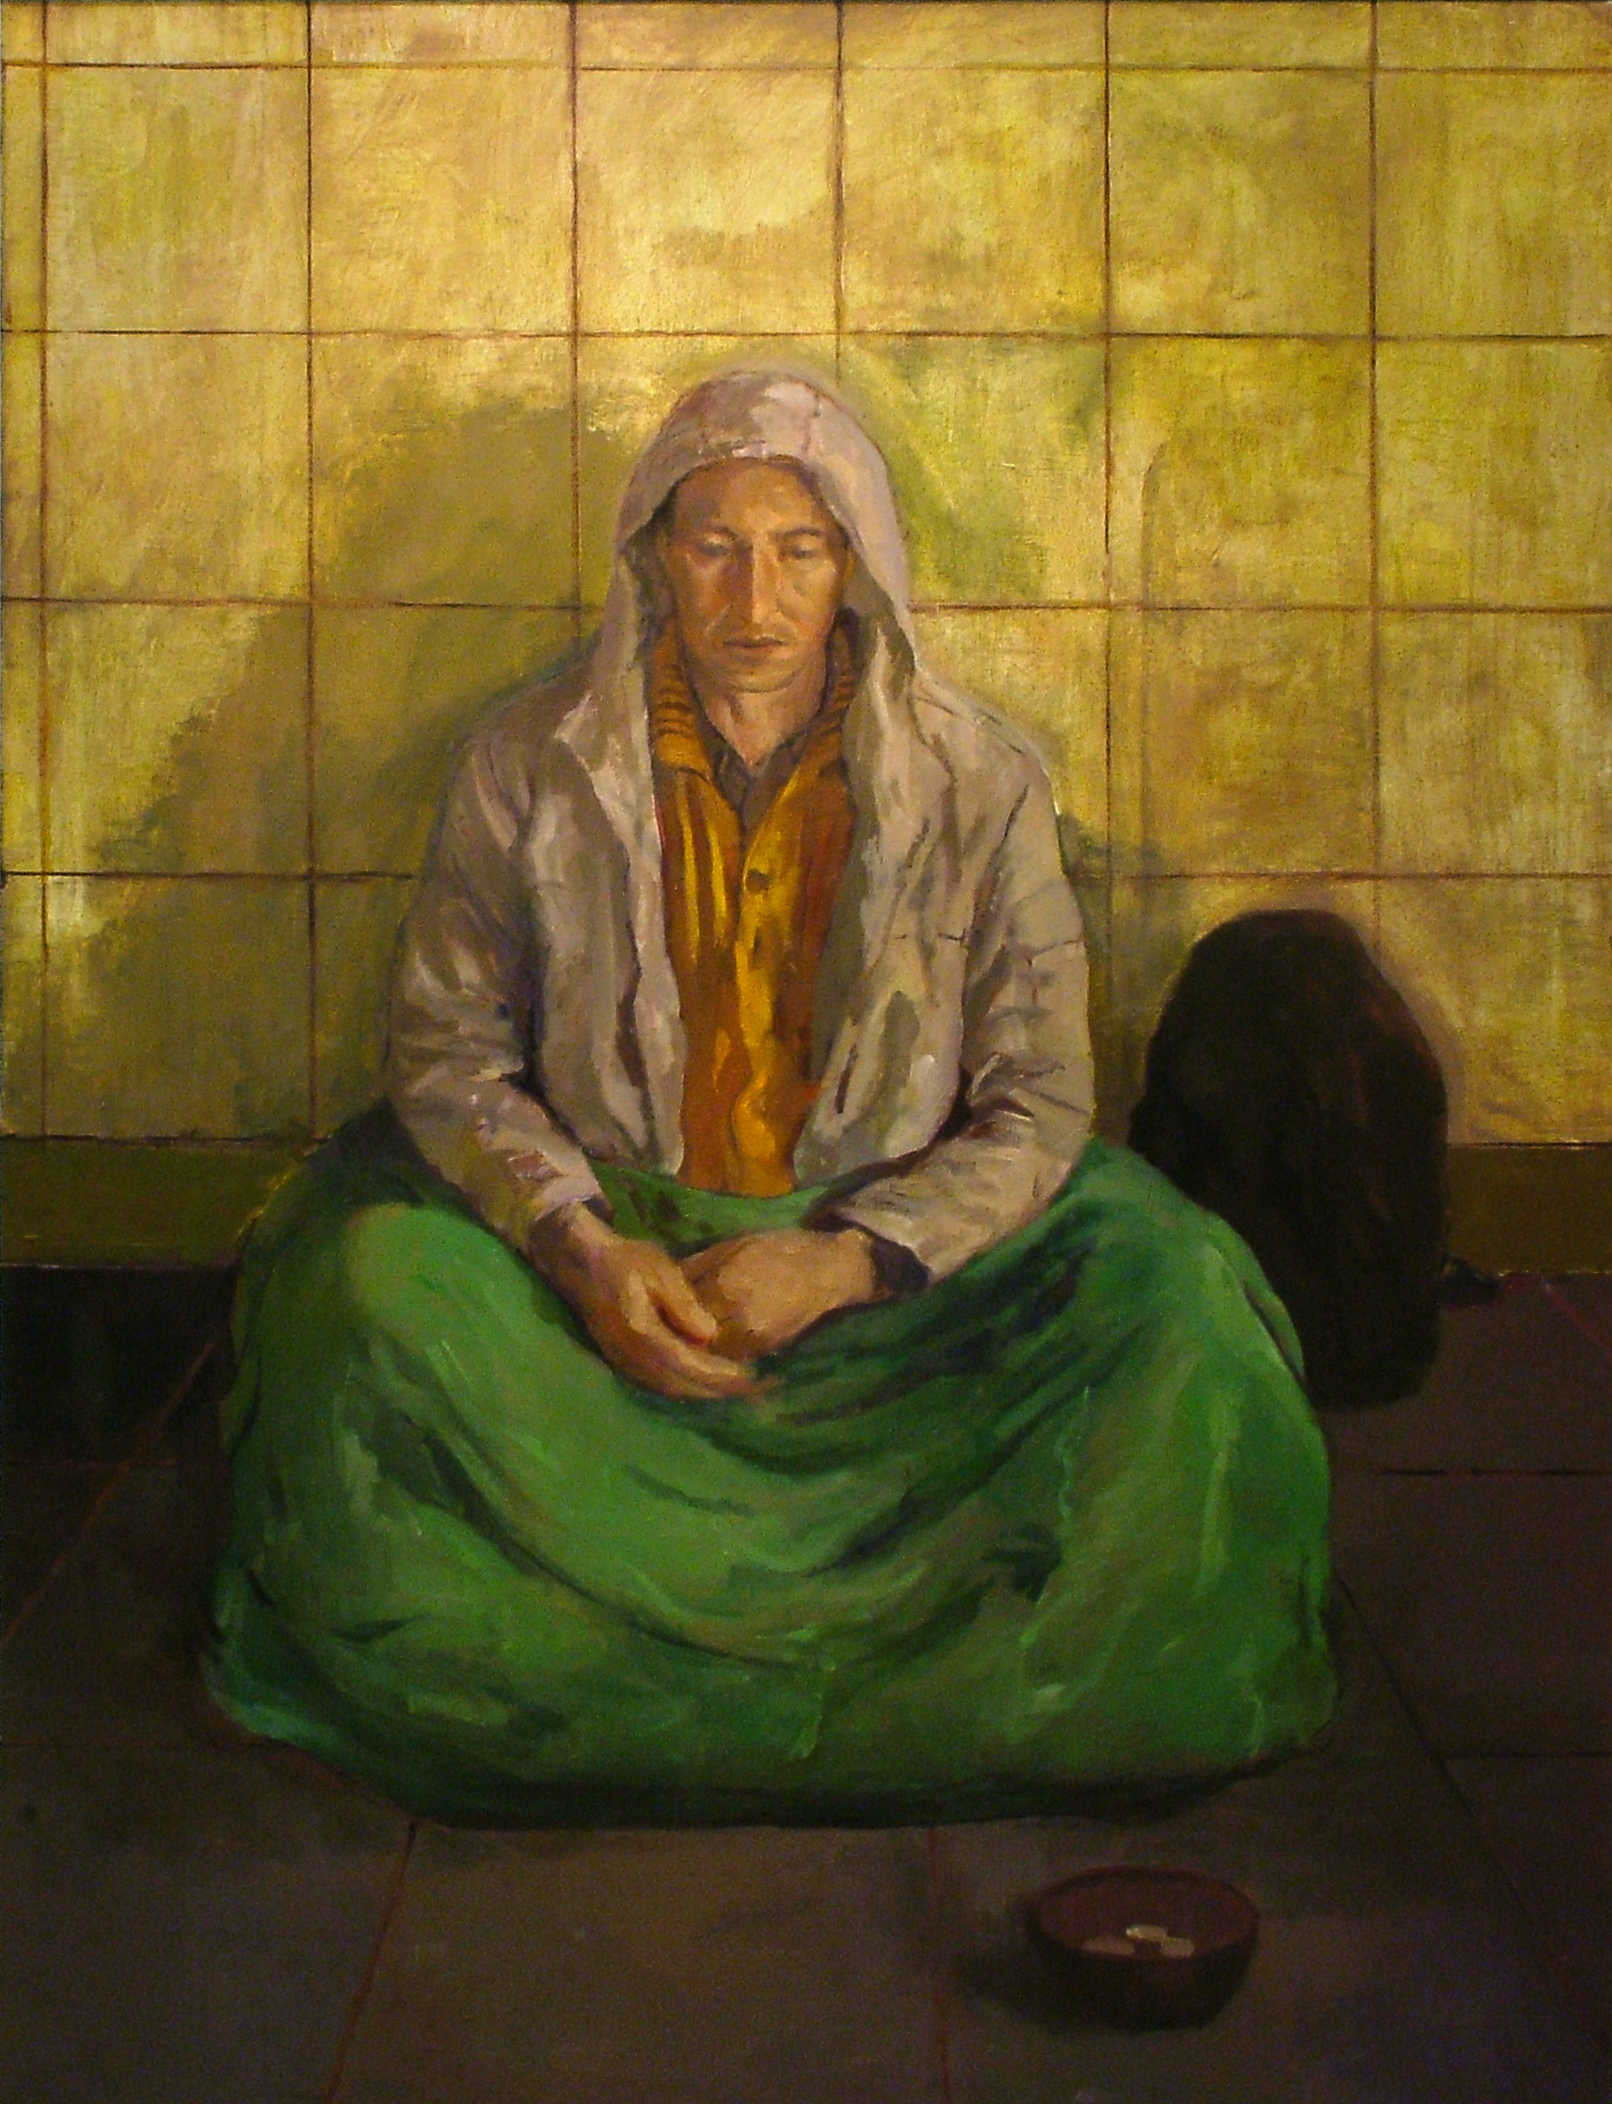 """Homeless""2007   Oil on canvas"